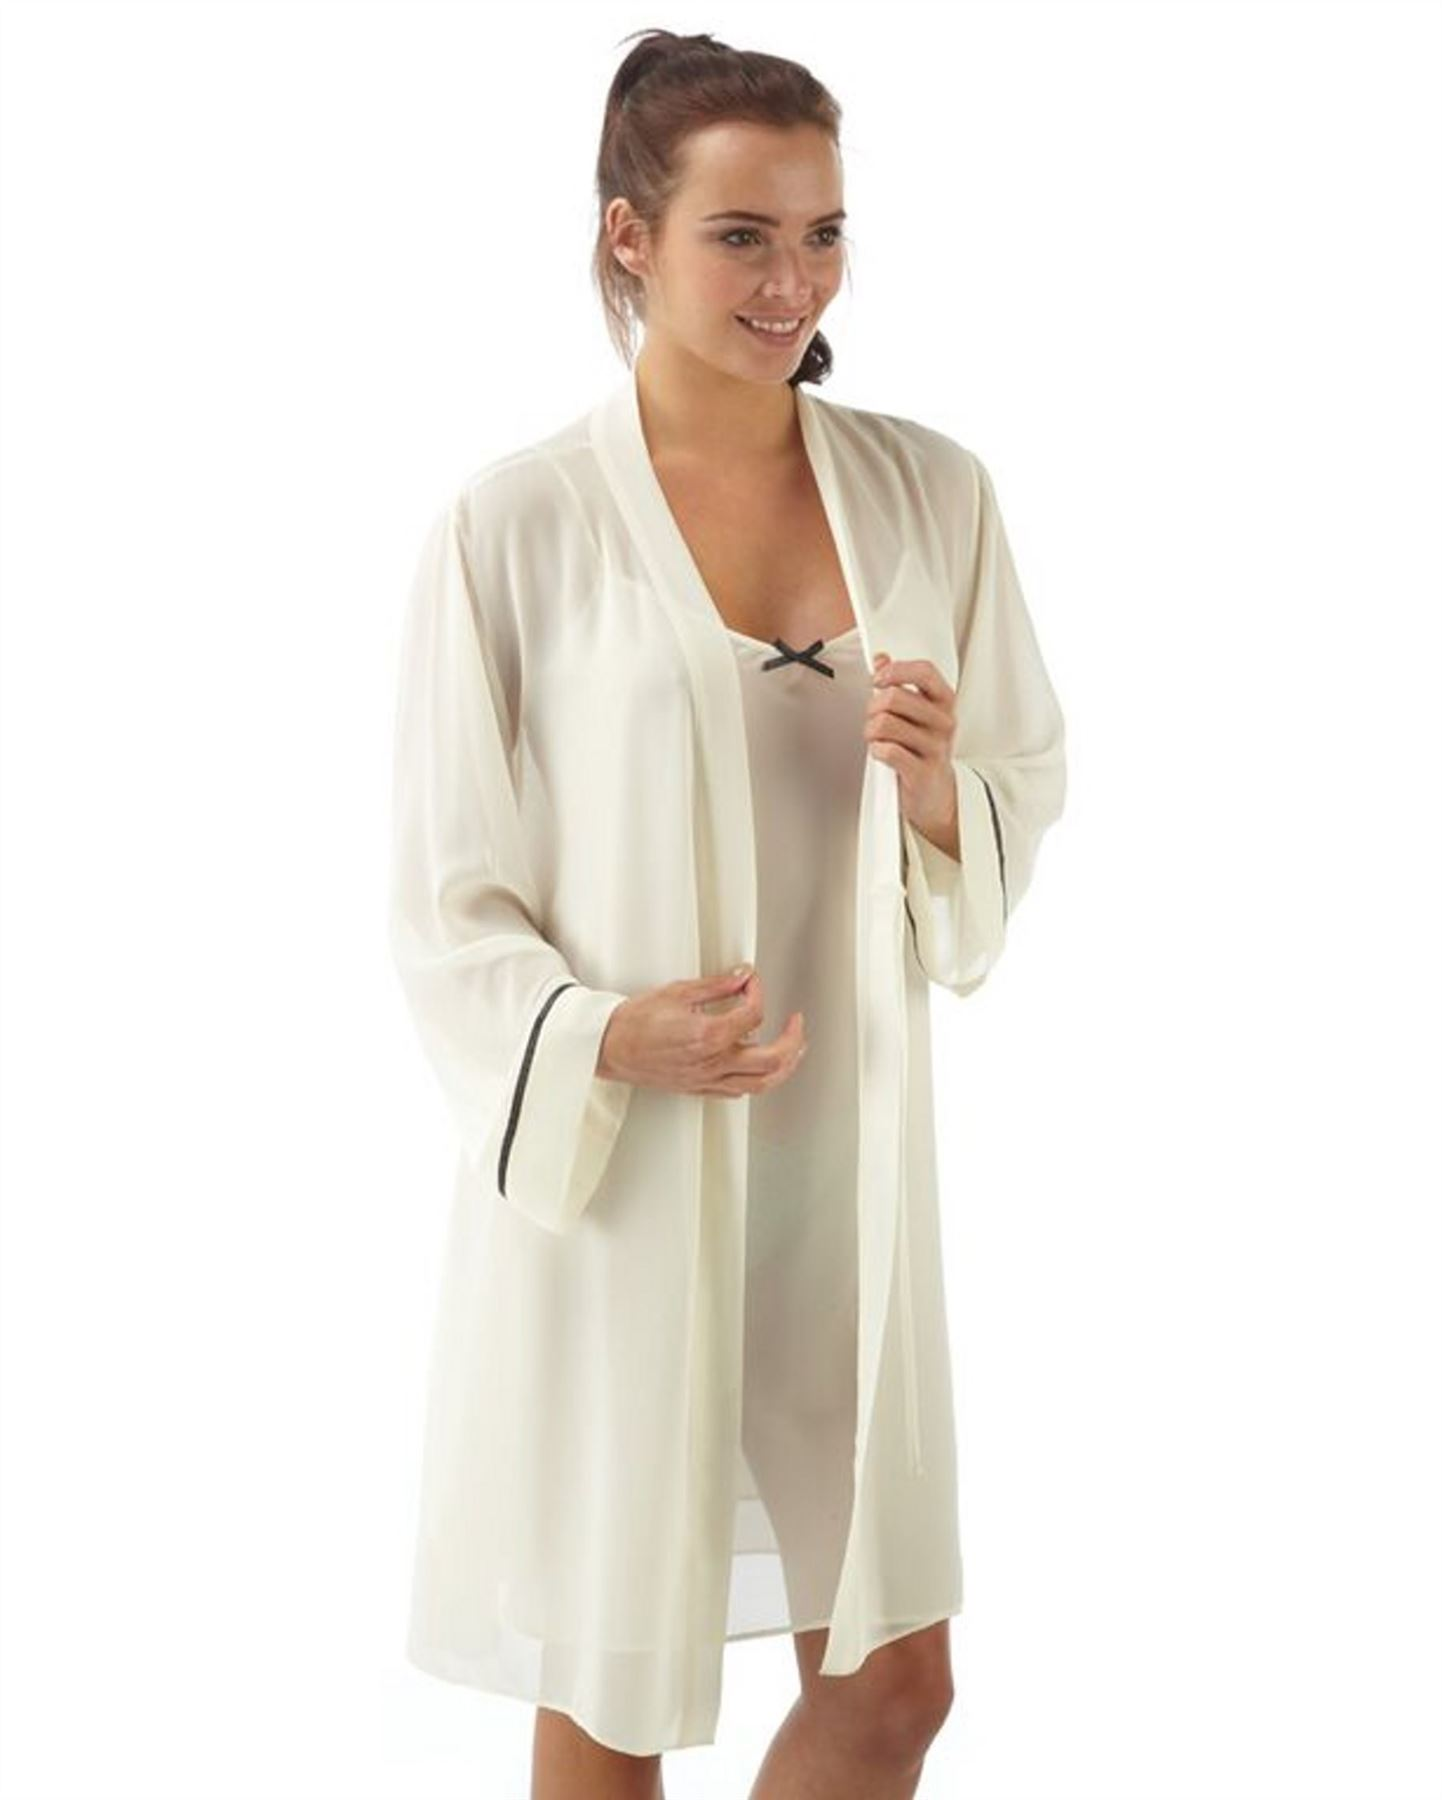 damen kimono morgenmantel negligee set chiffon 38 40 42 44. Black Bedroom Furniture Sets. Home Design Ideas